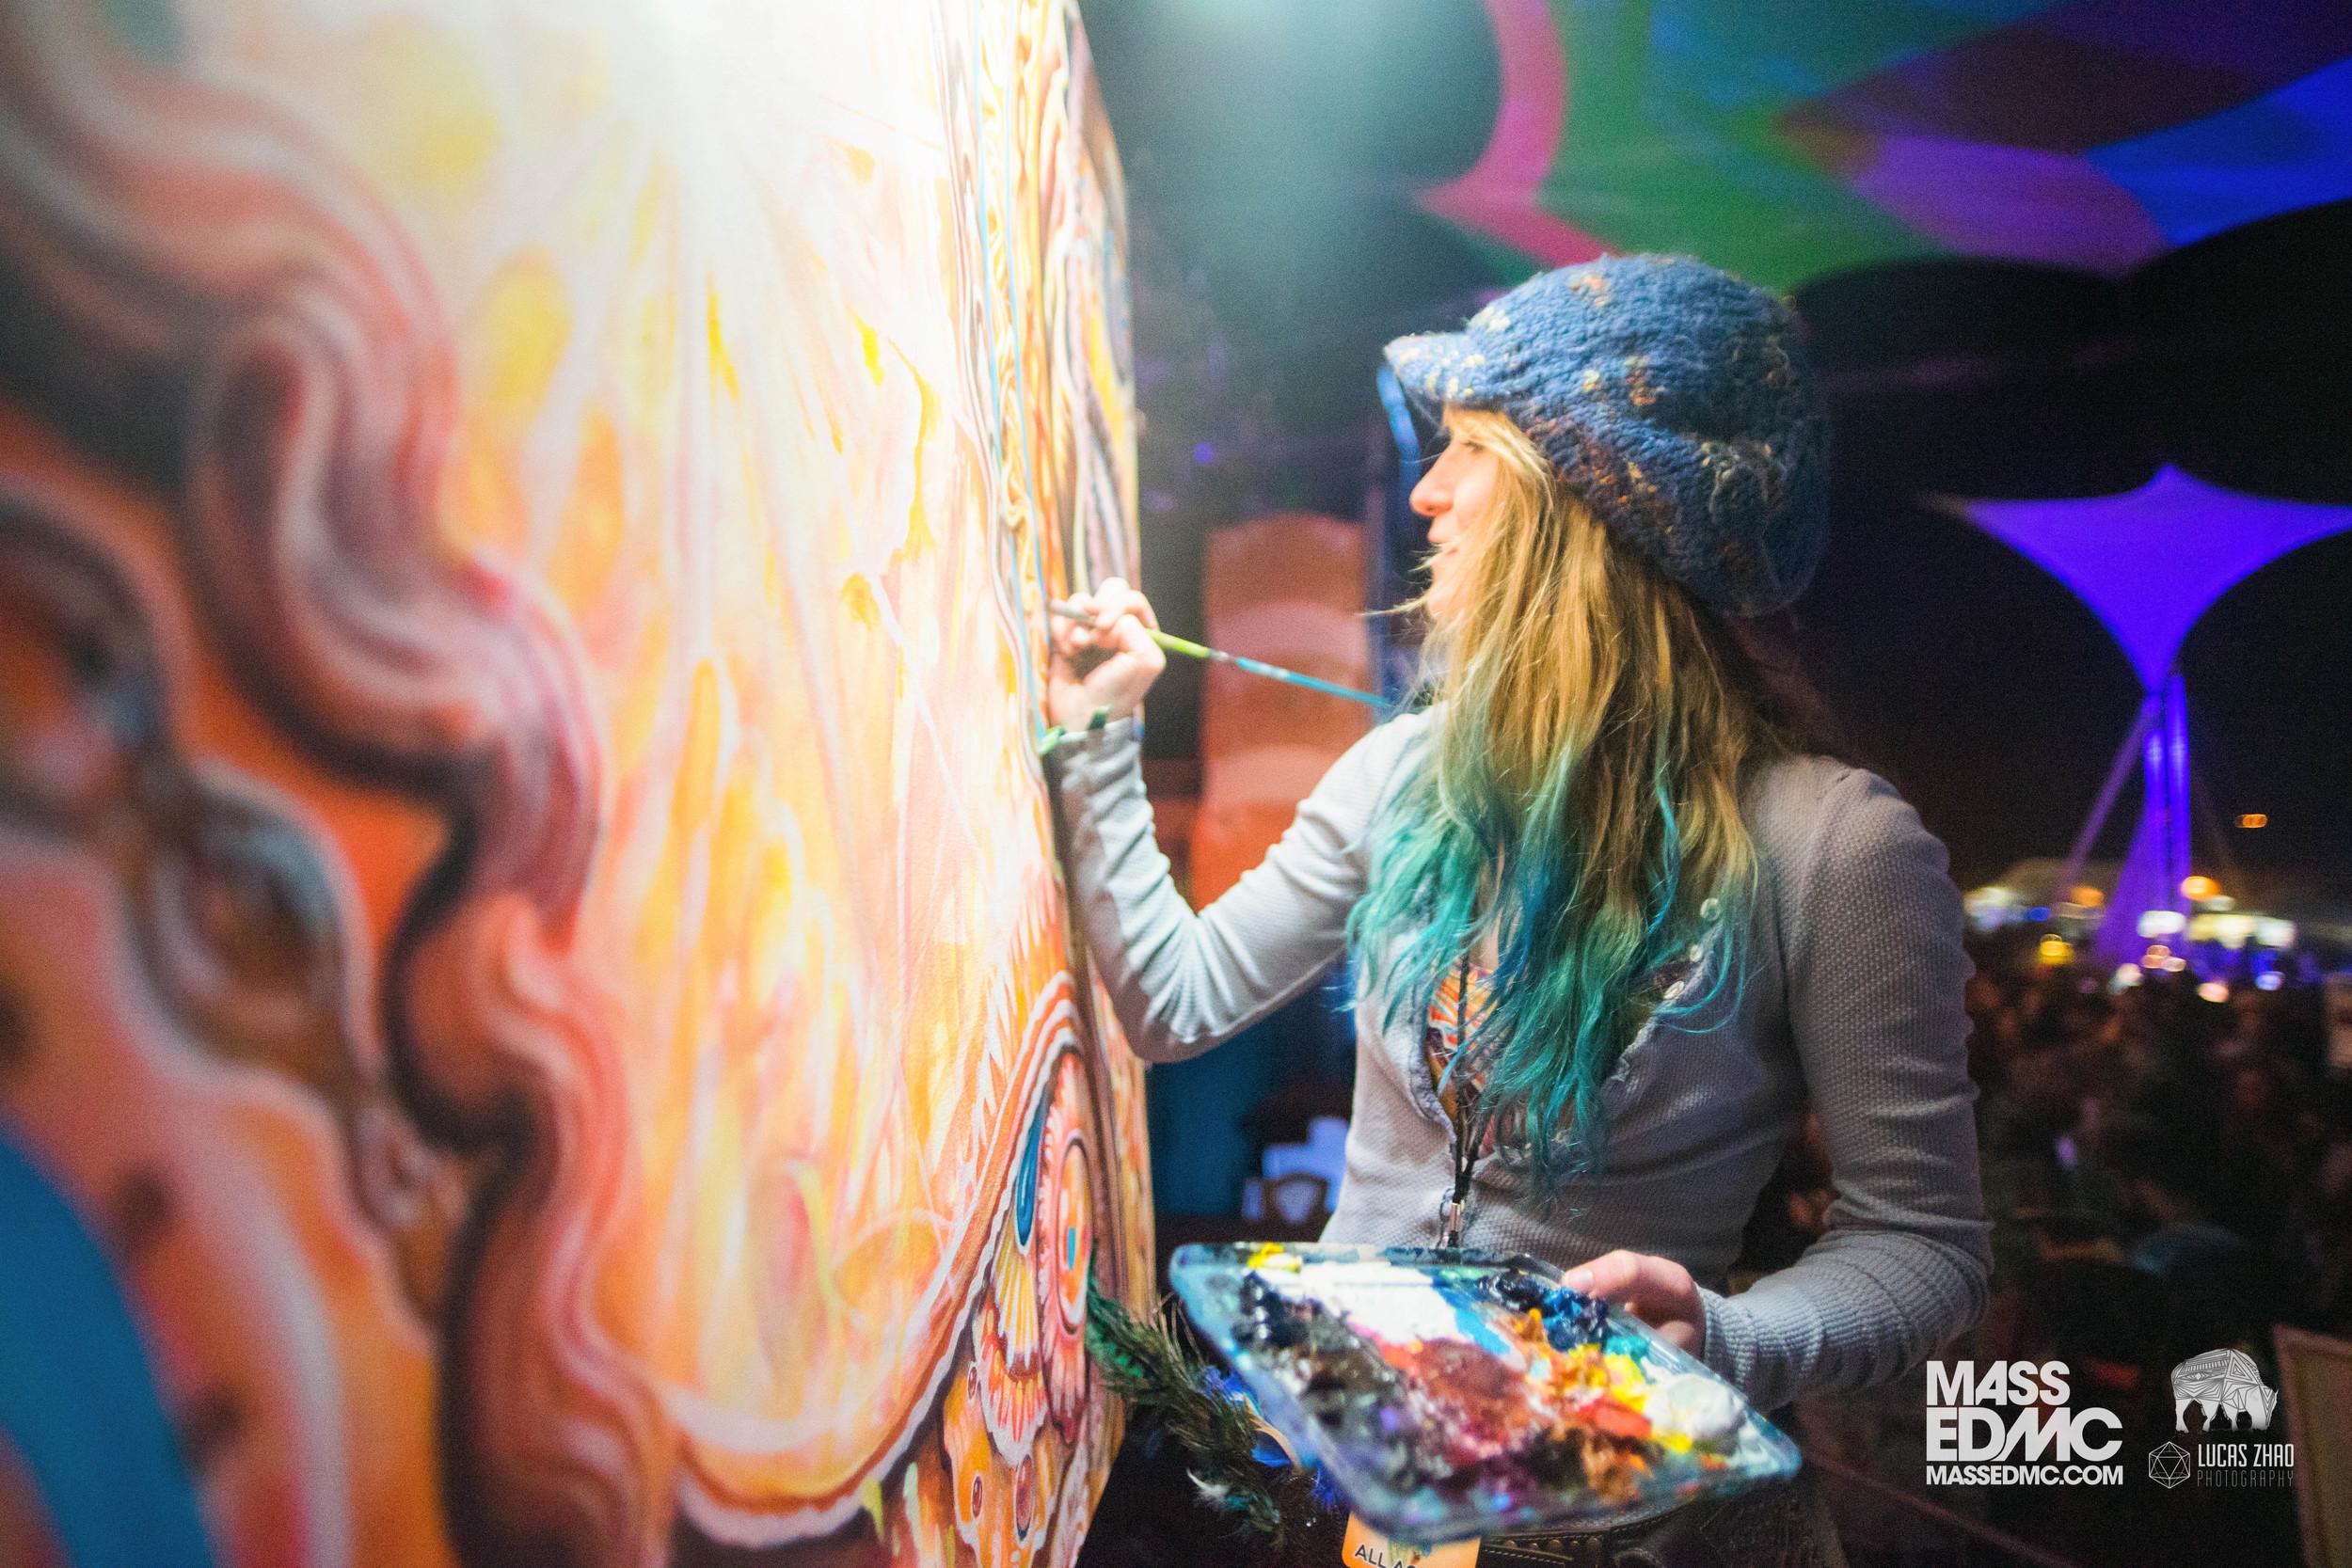 Morgan Mandala (pictured above) collaborating with Randal Roberts.